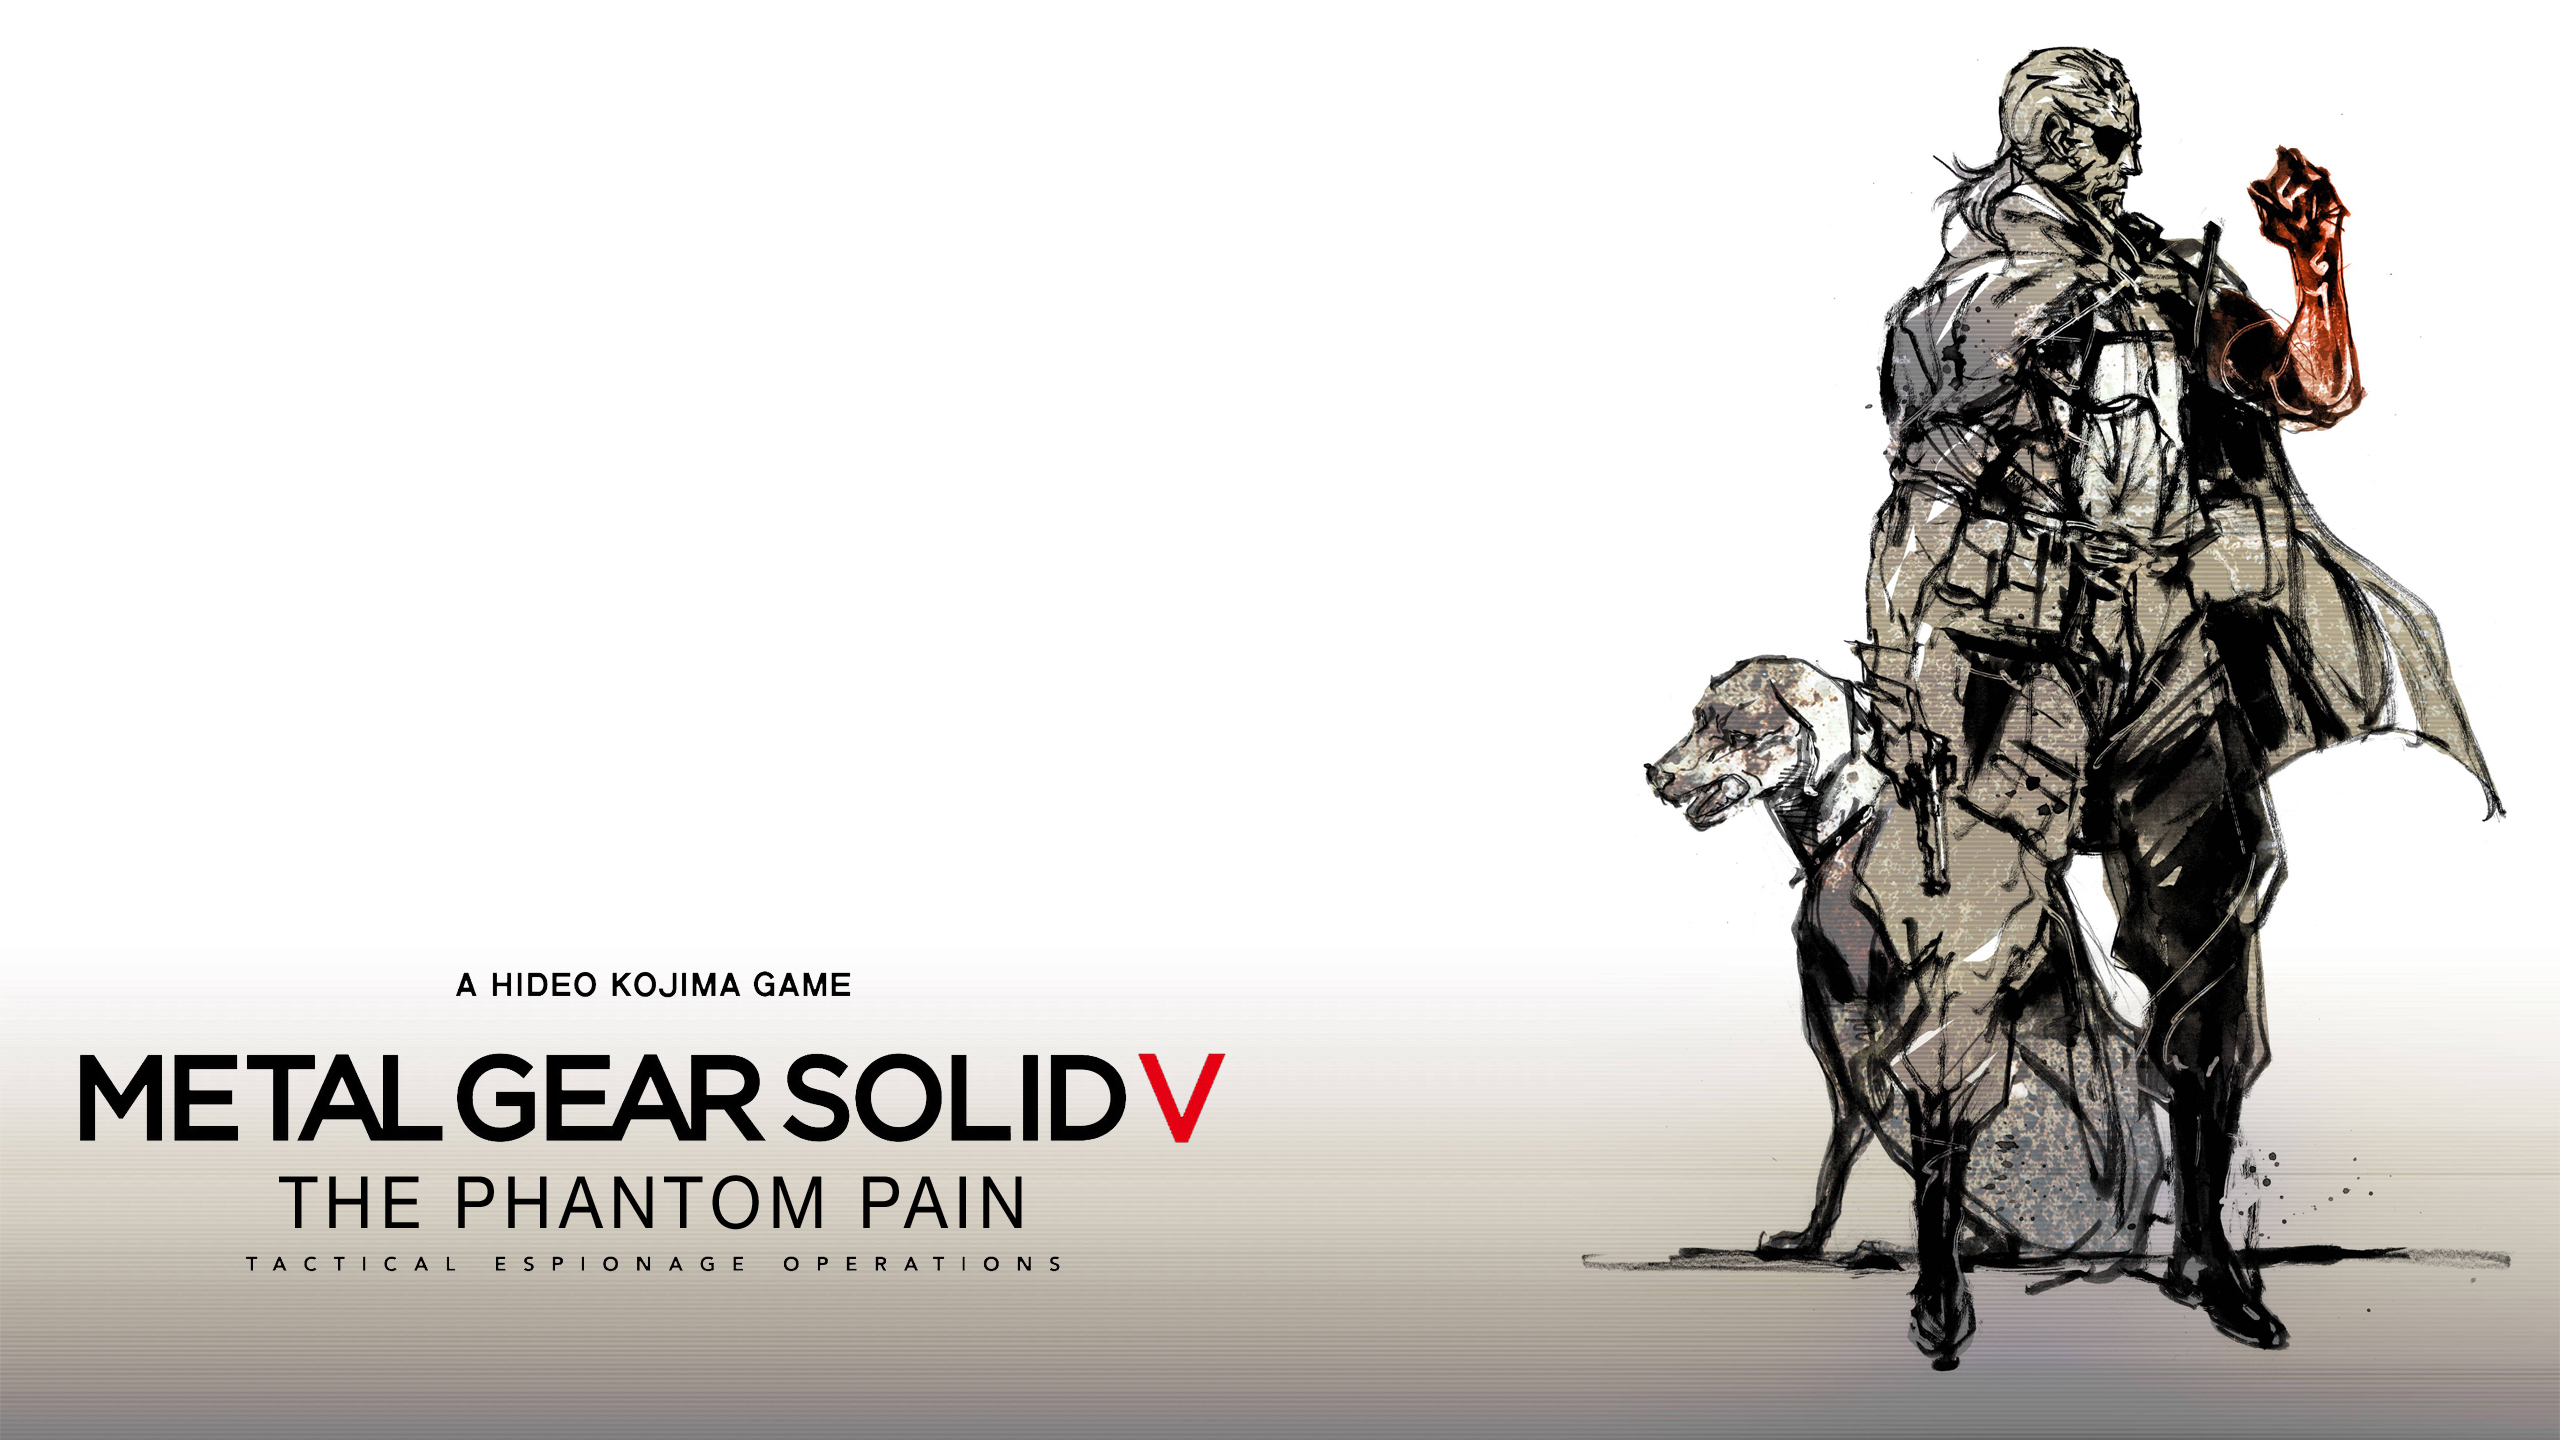 Desktop Wallpapers Metal Gear Dog Kojima Productions Art 2560x1440